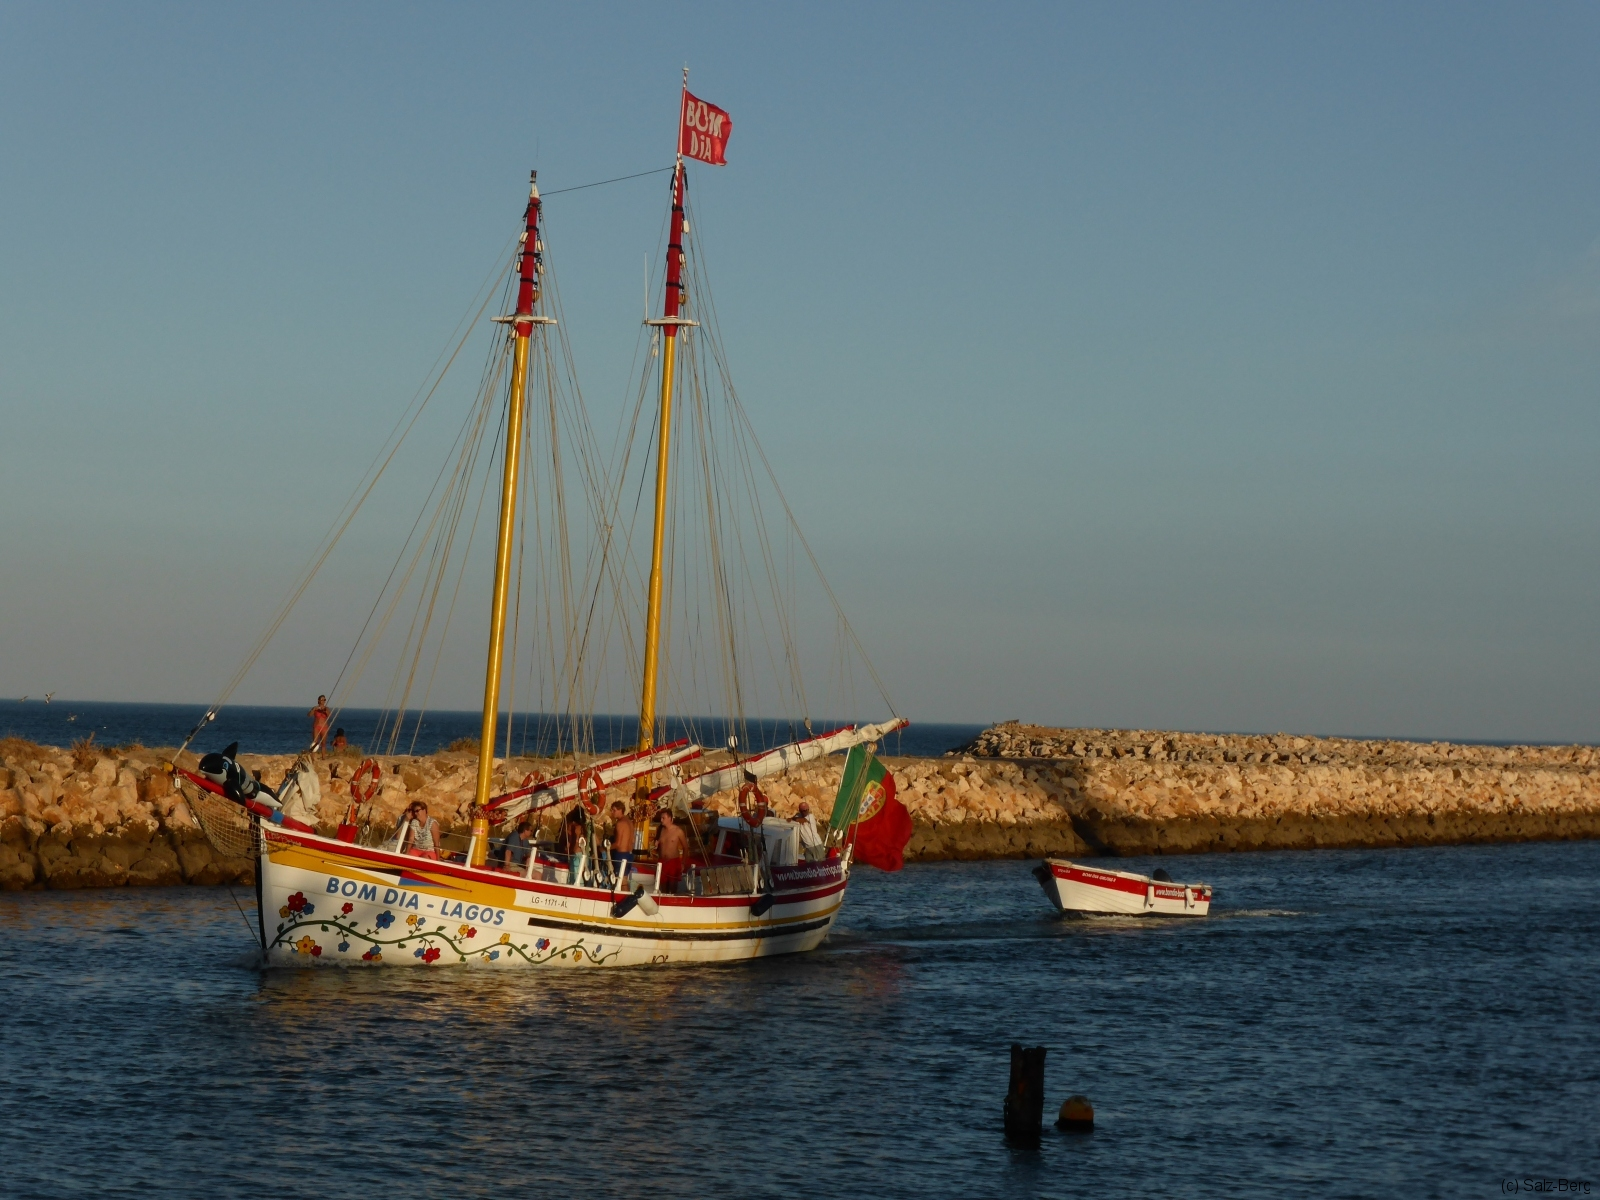 Algarve-021-P1050623